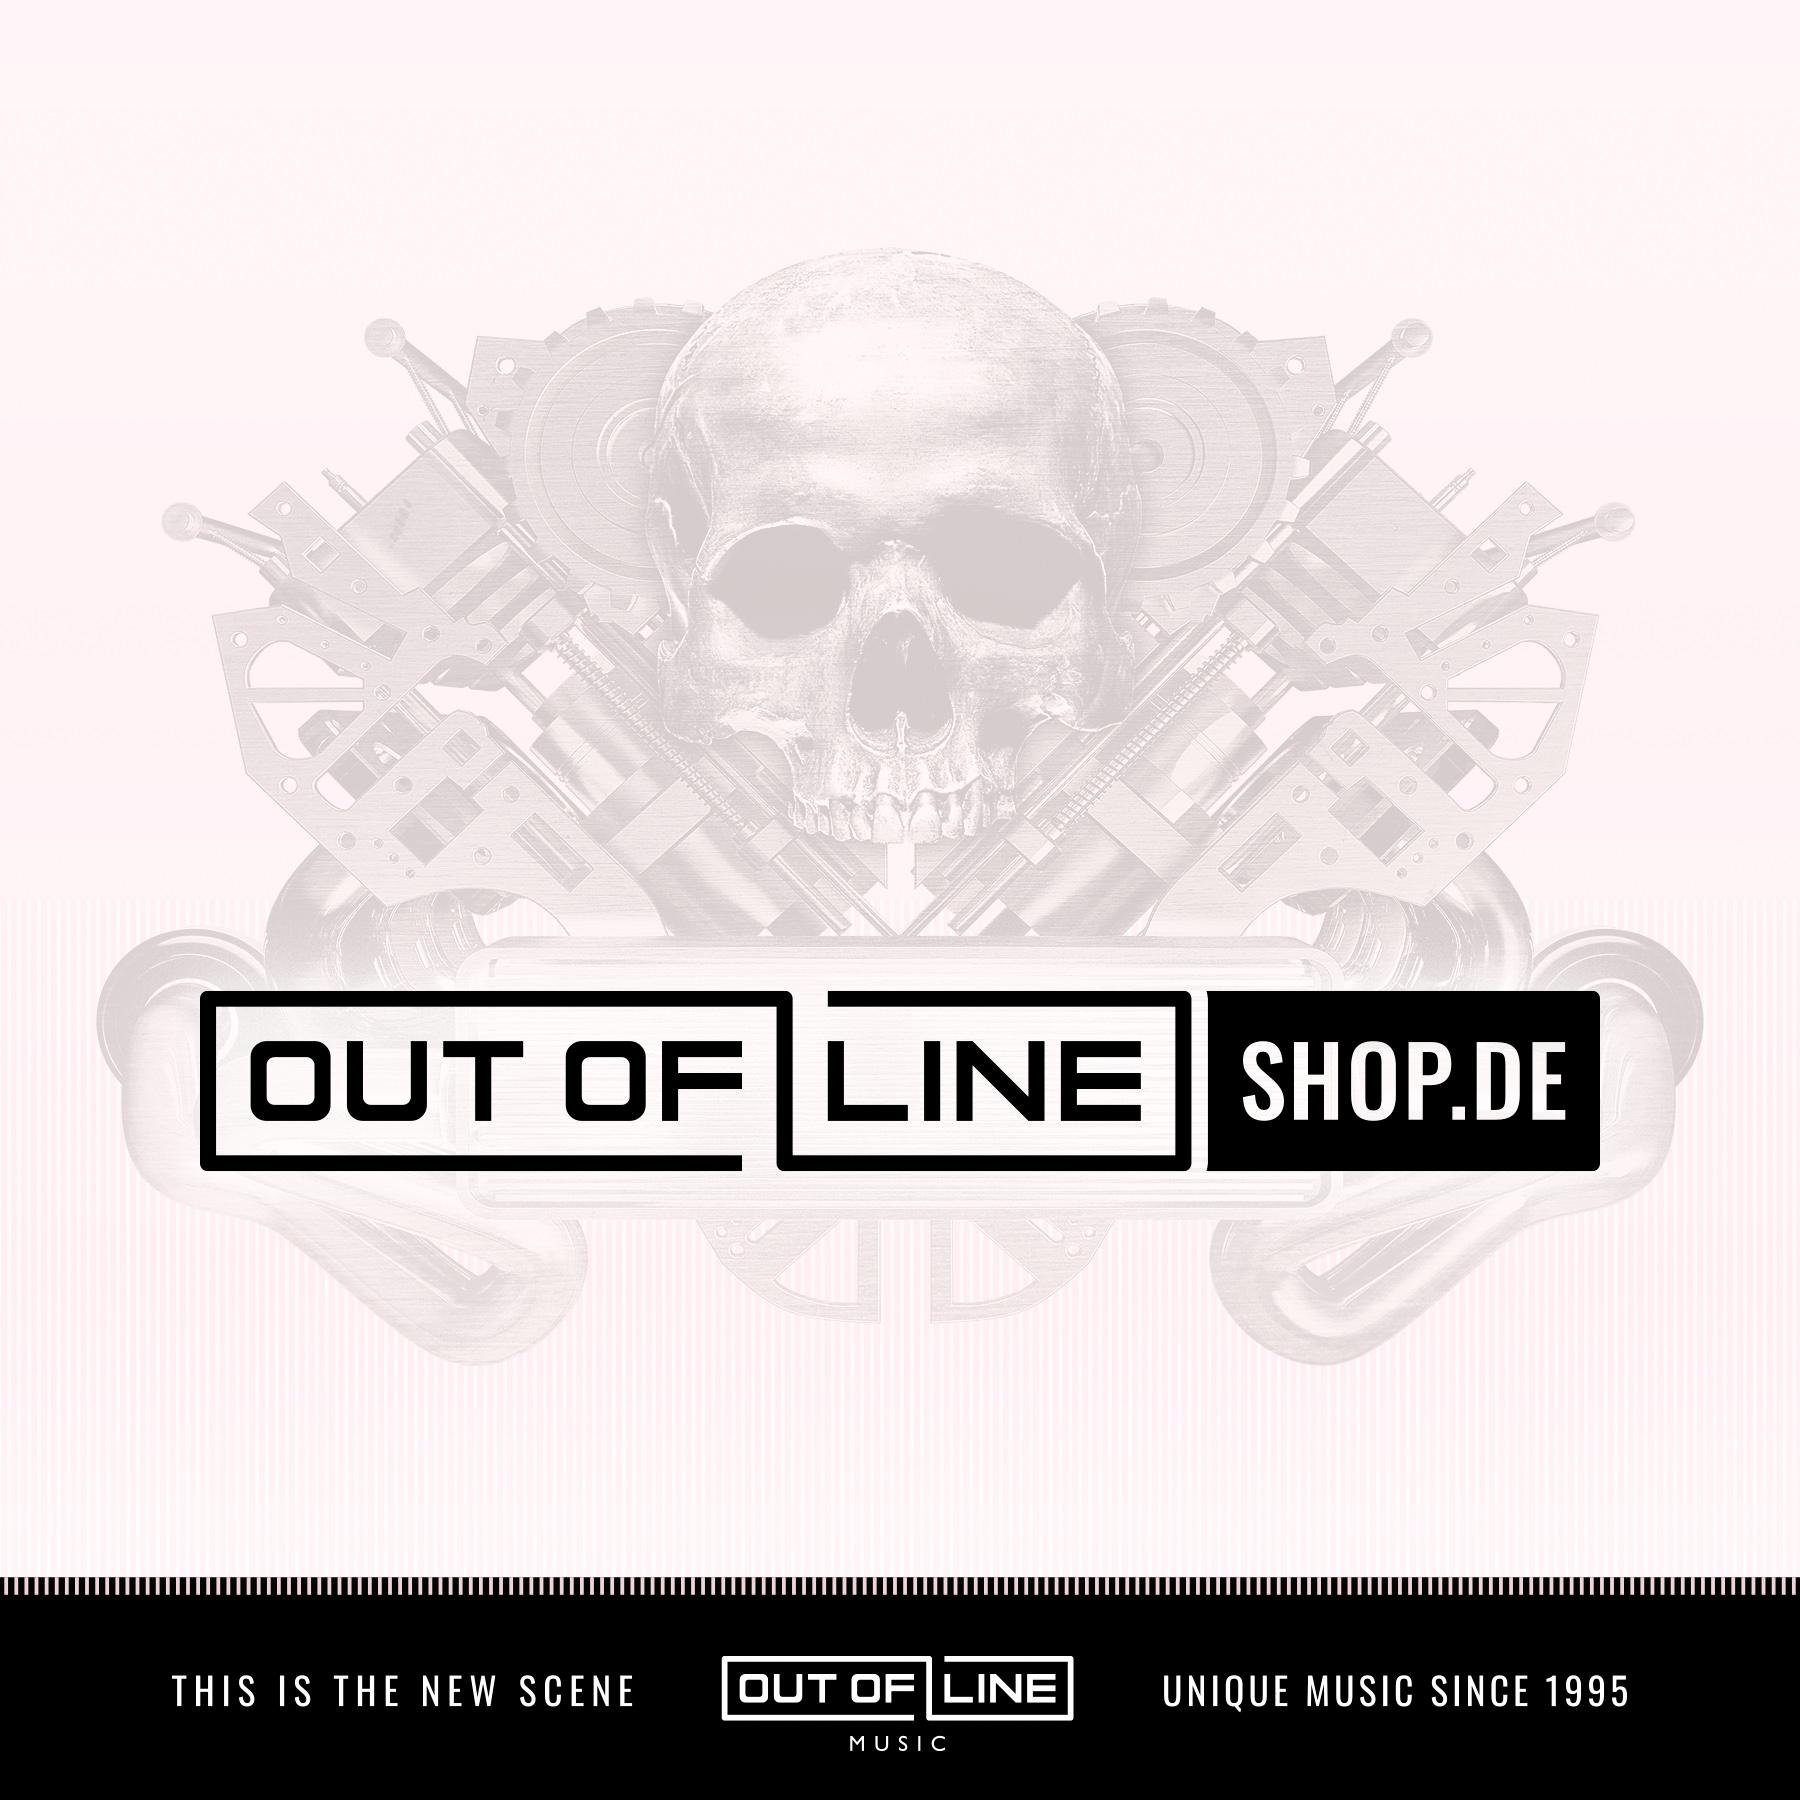 KMFDM - Paradise (Limited Edition) - 2LP